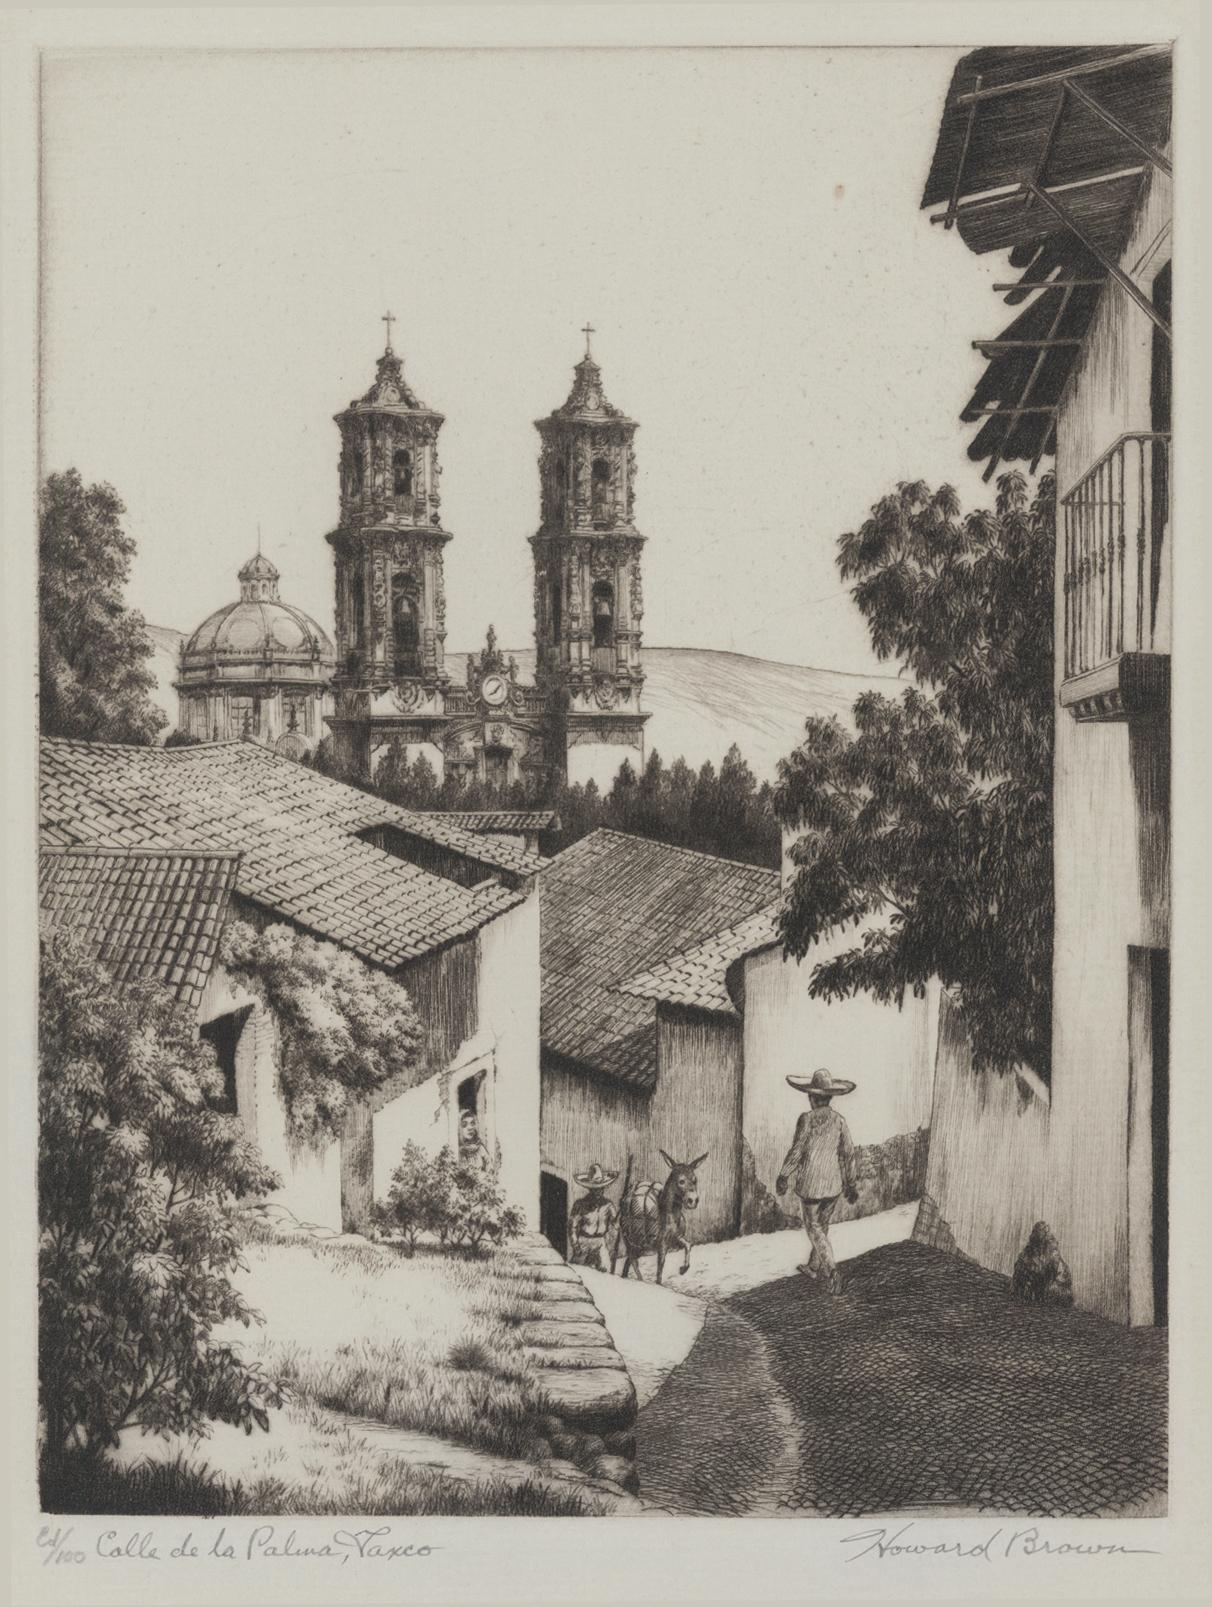 Calle de la Palma, Taxco